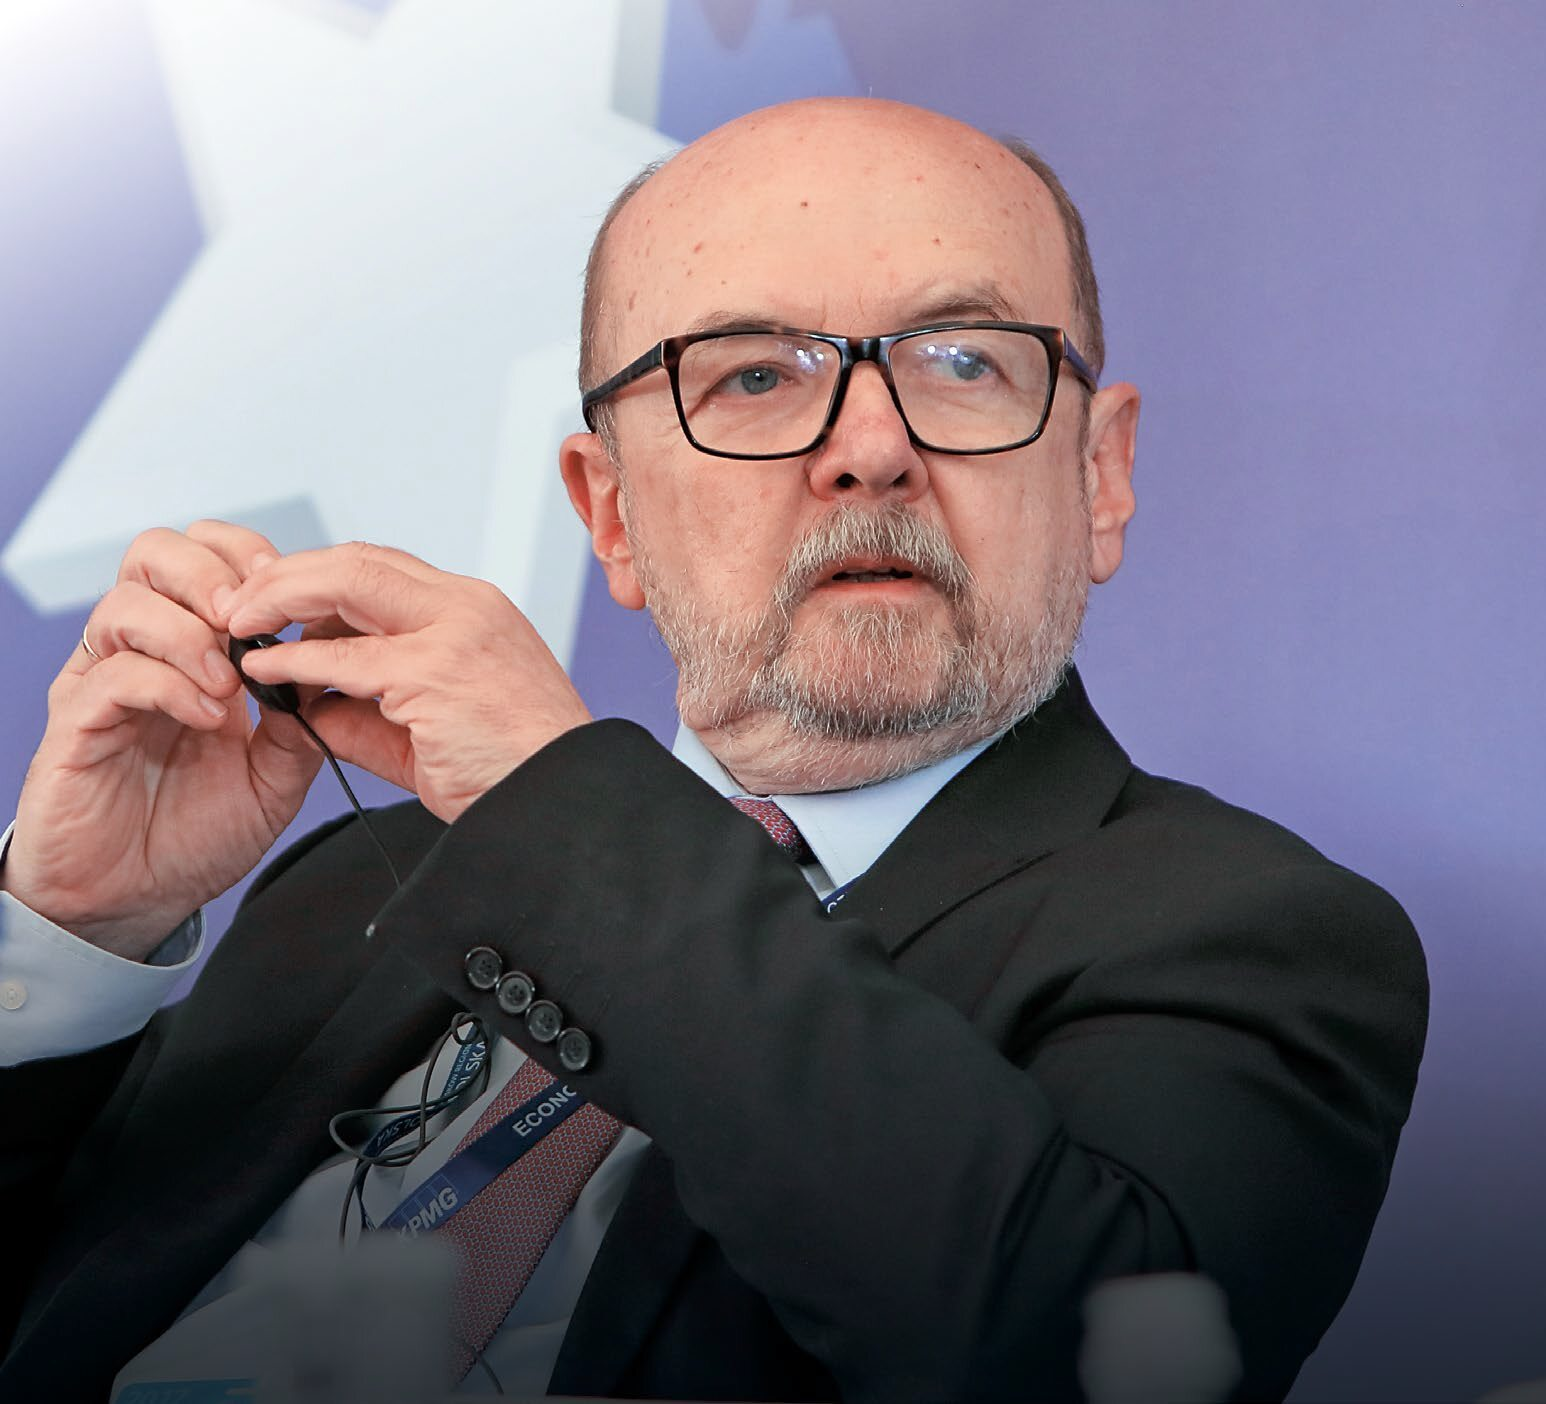 Prof. Ryszard Legutko (PiS)